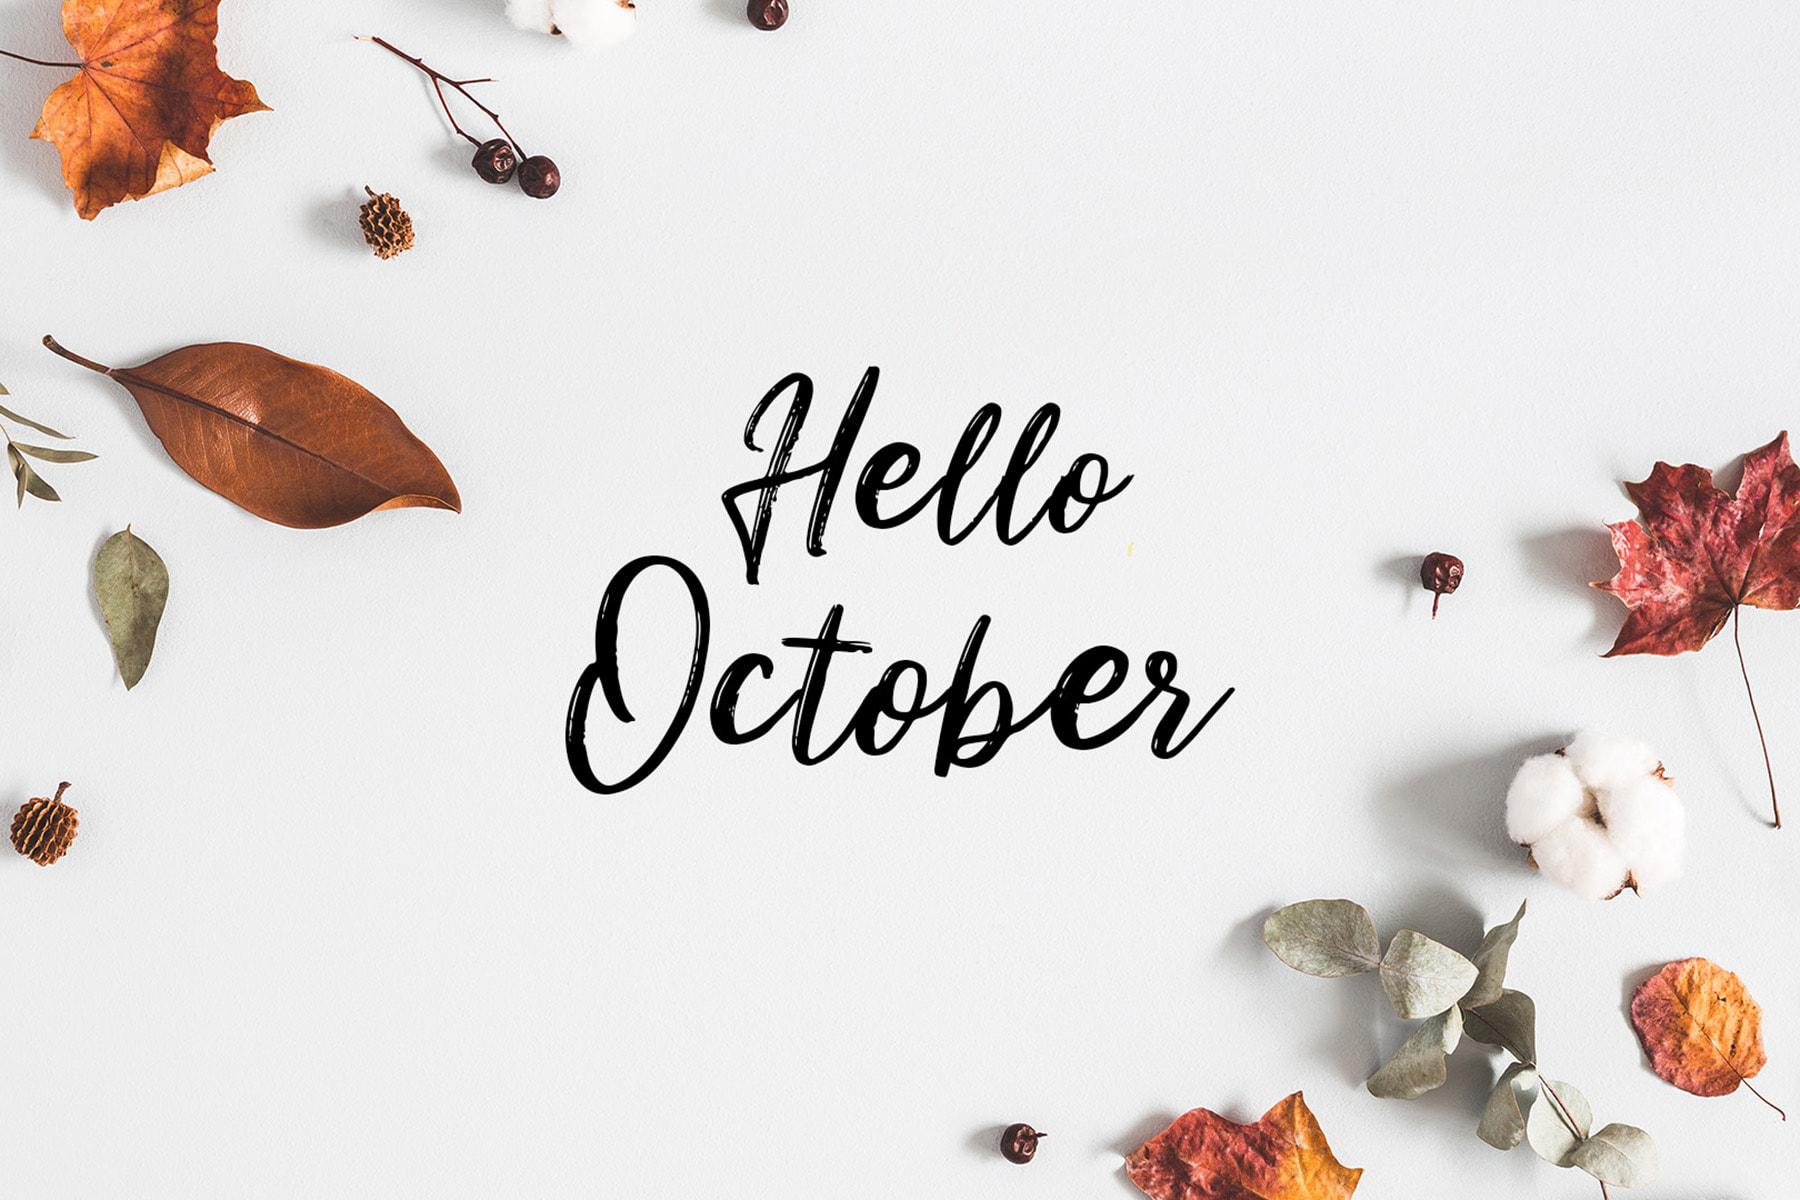 Hello Oktober! Salam Jumaat Buat Korang Semua!